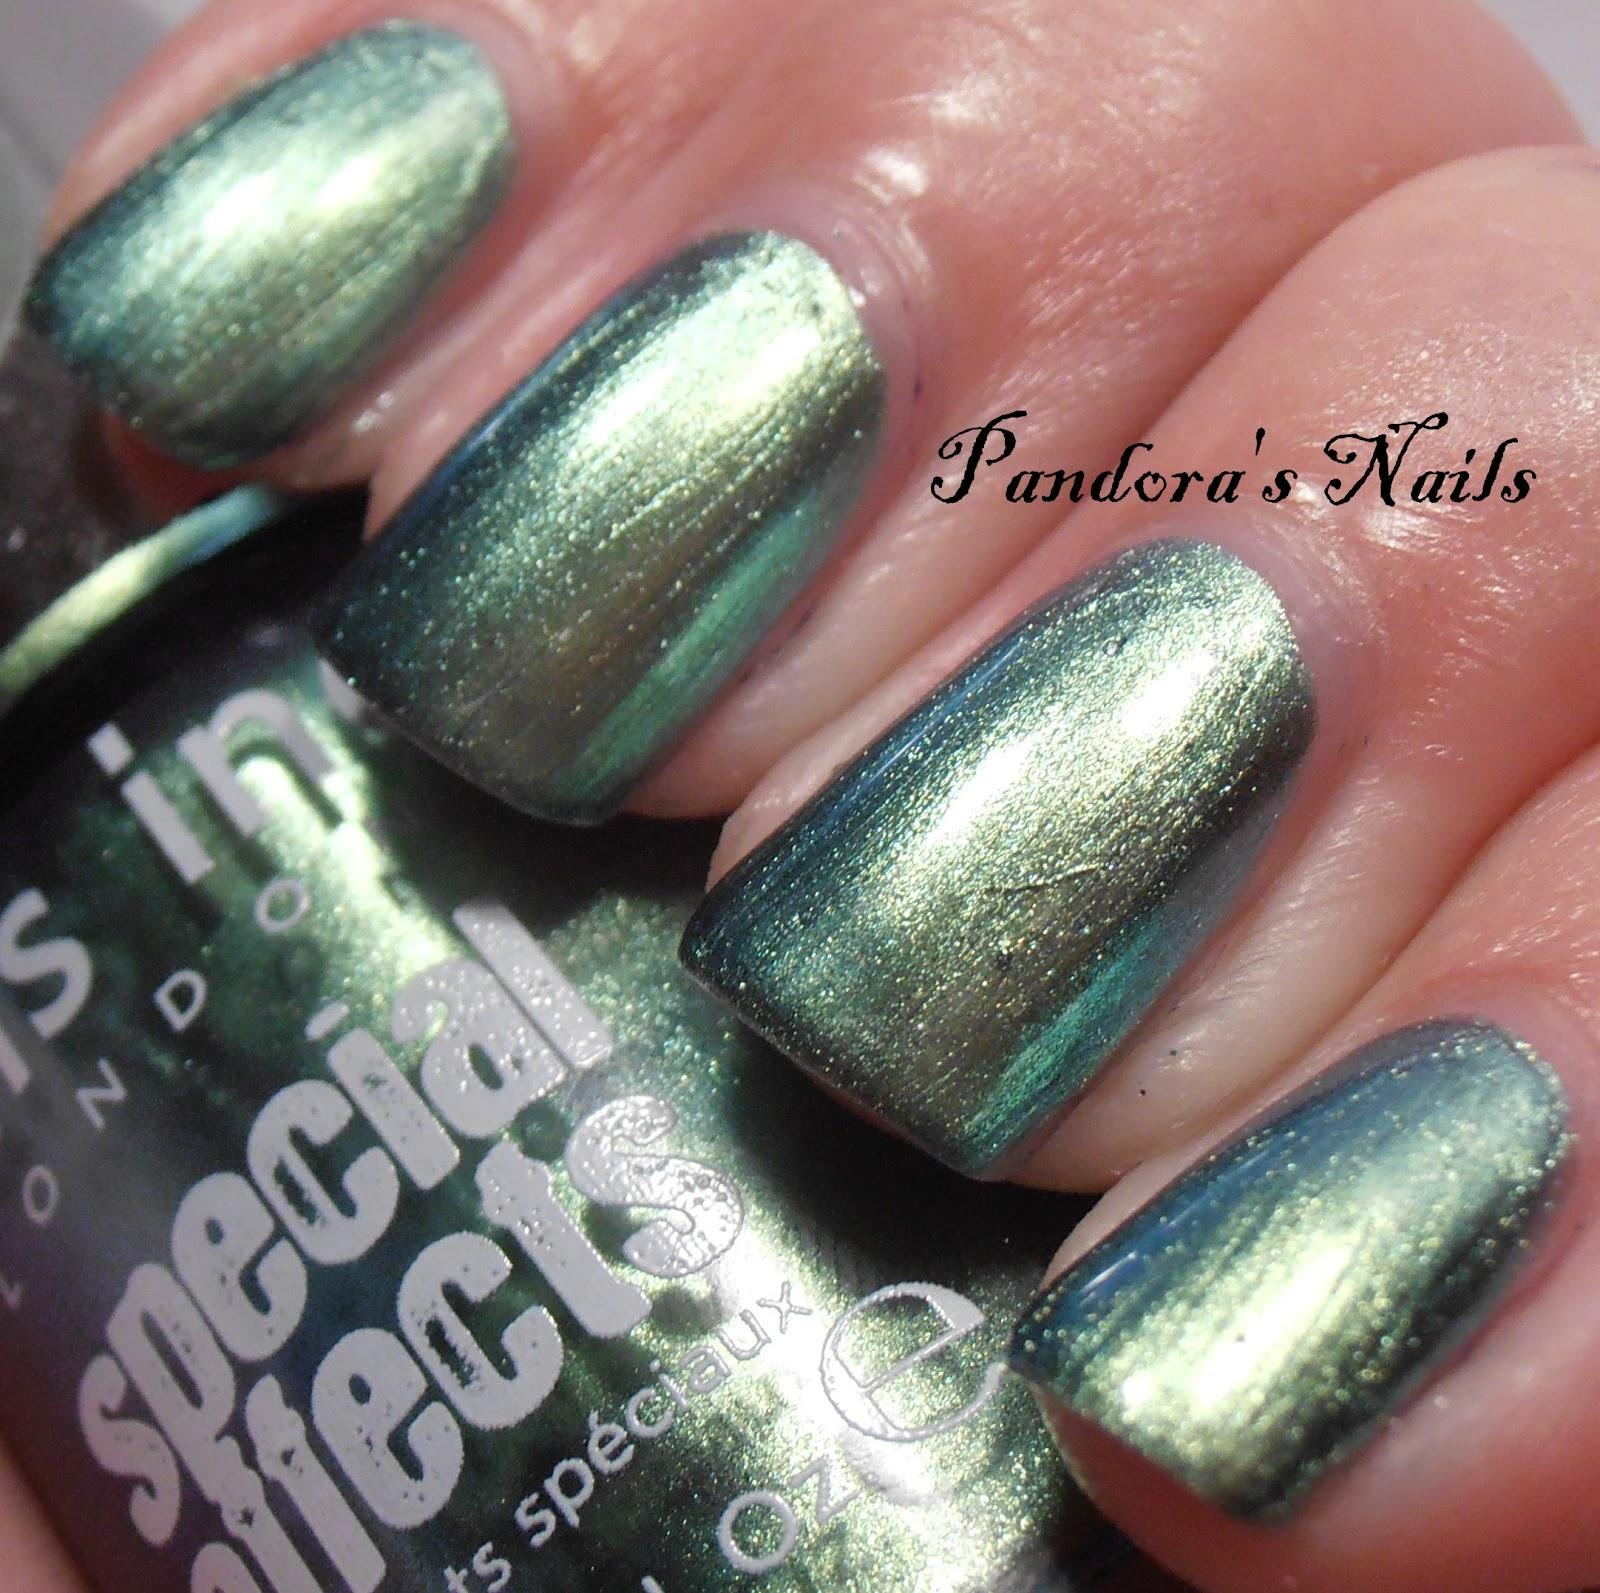 Pandora's Nails: Nails Inc Swiss Cottage Mirror Metallic